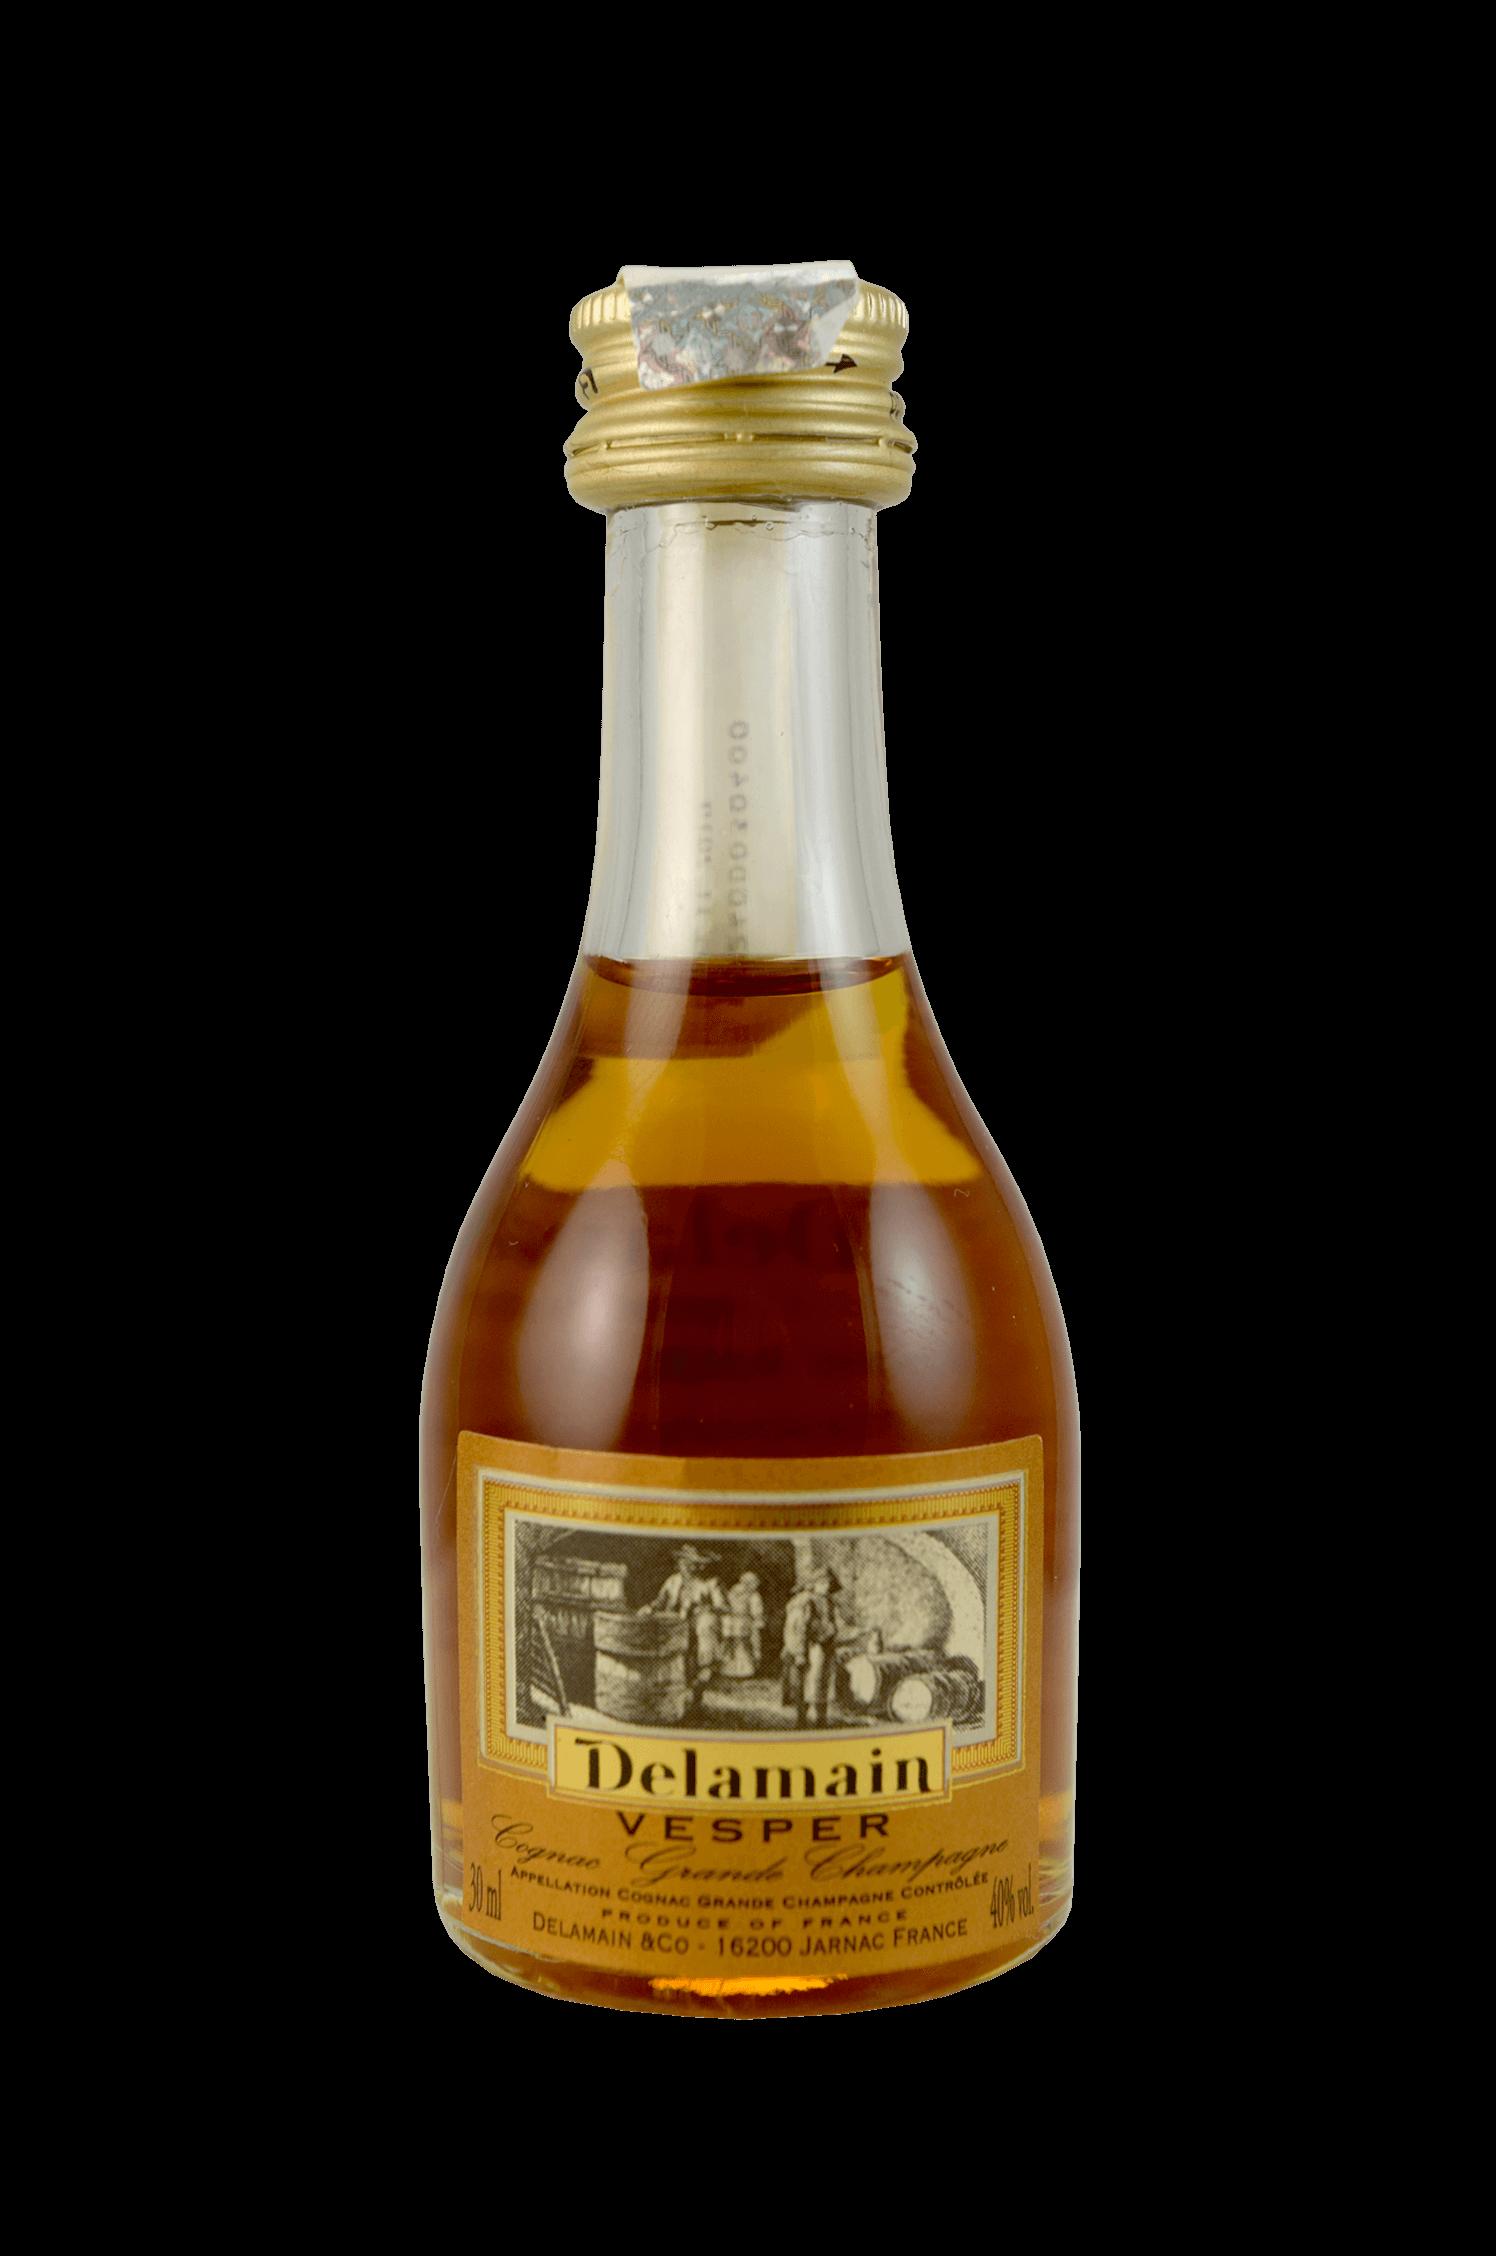 Delamain Vesper